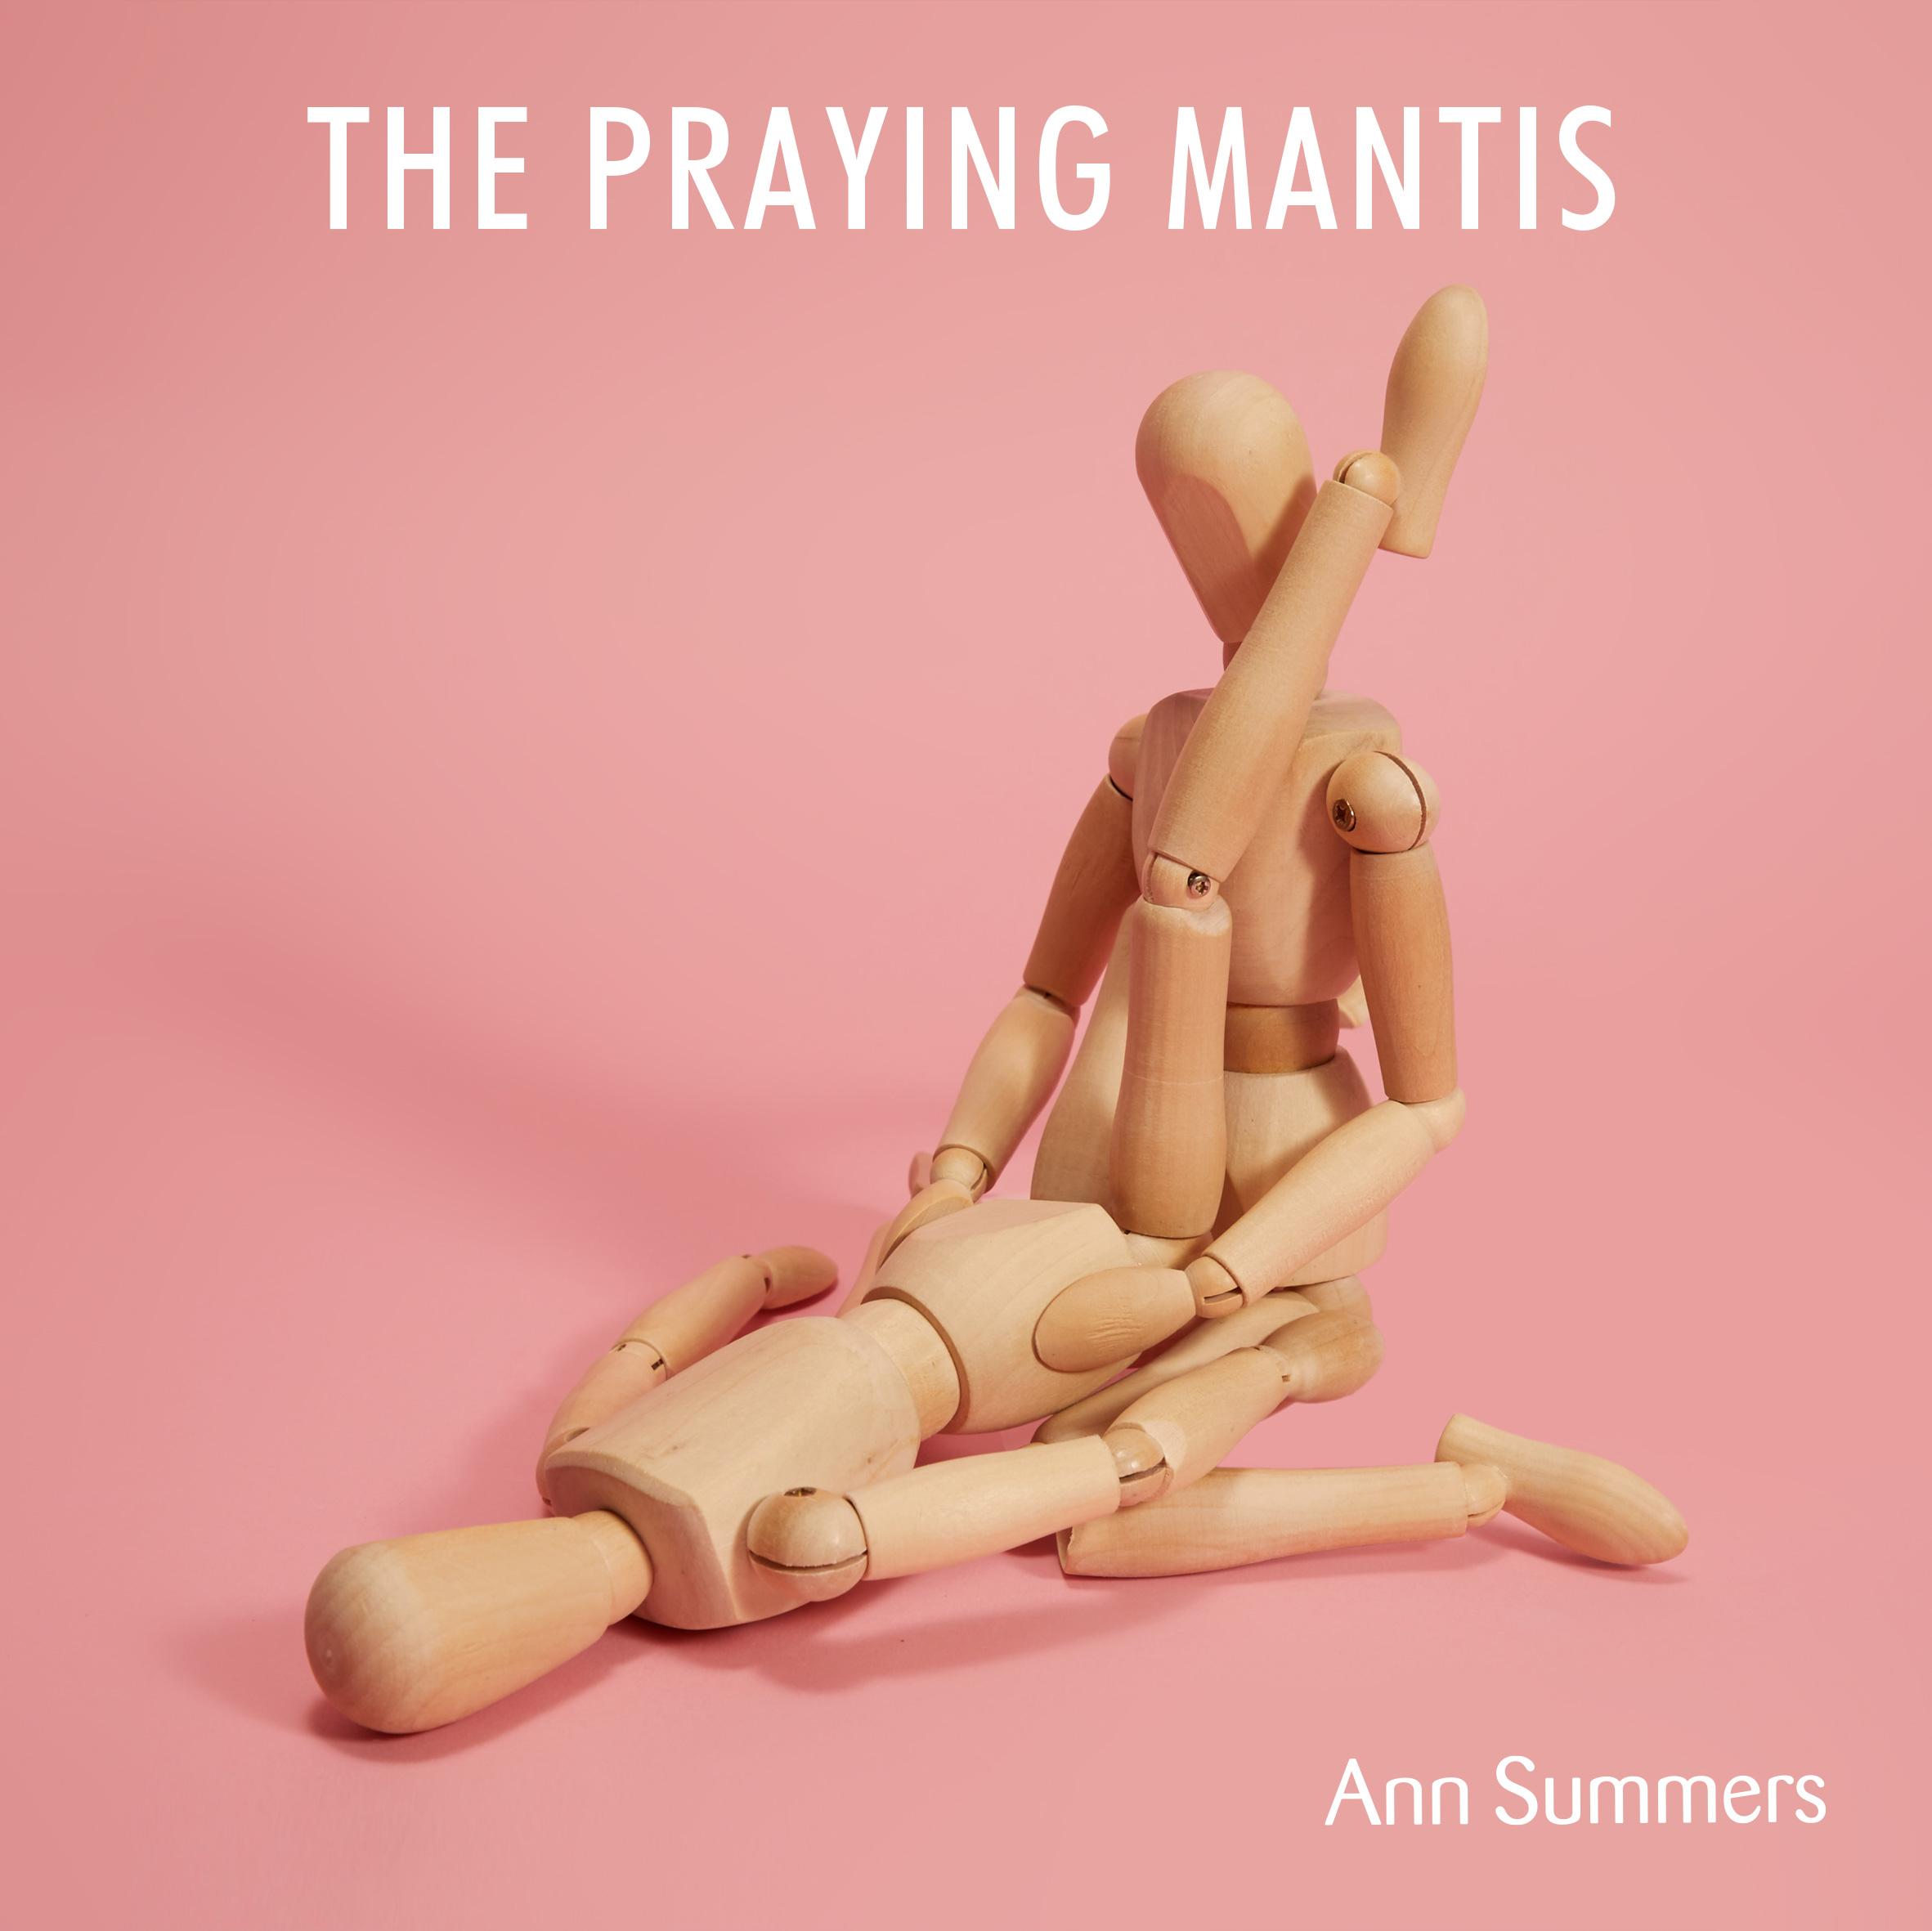 The Praying Mantis Sex Position